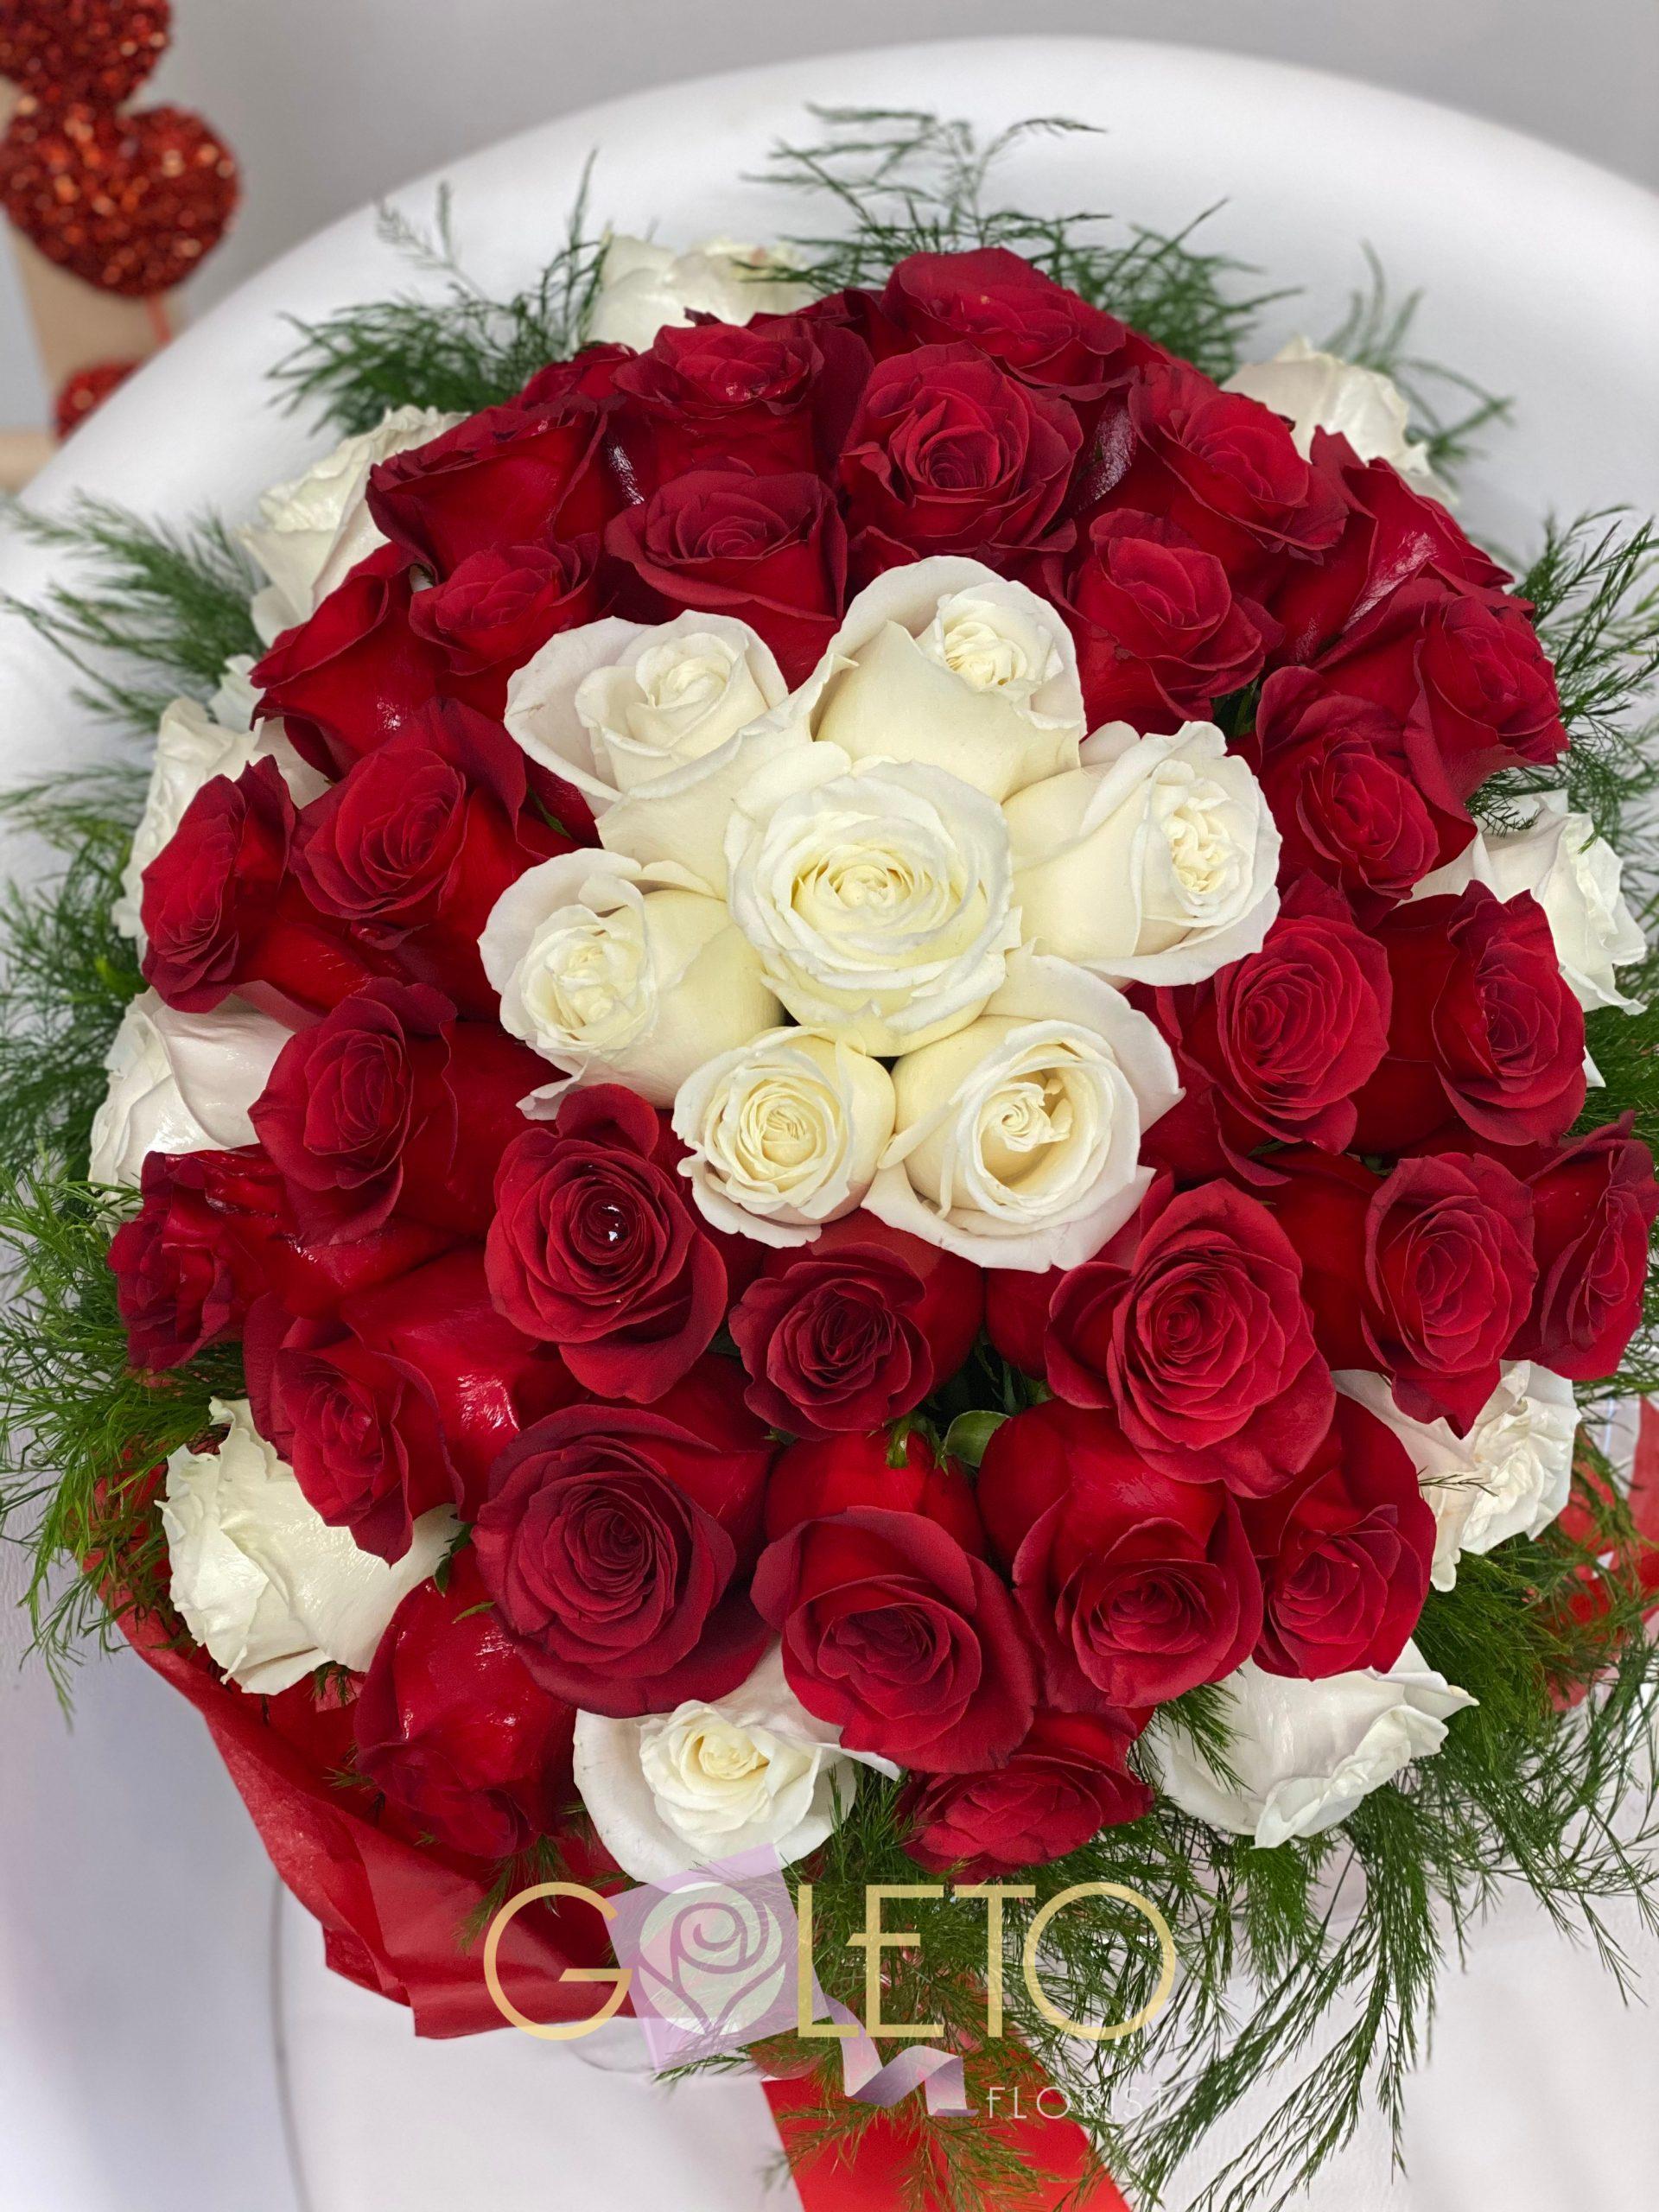 ValentineSDayFlowers 242